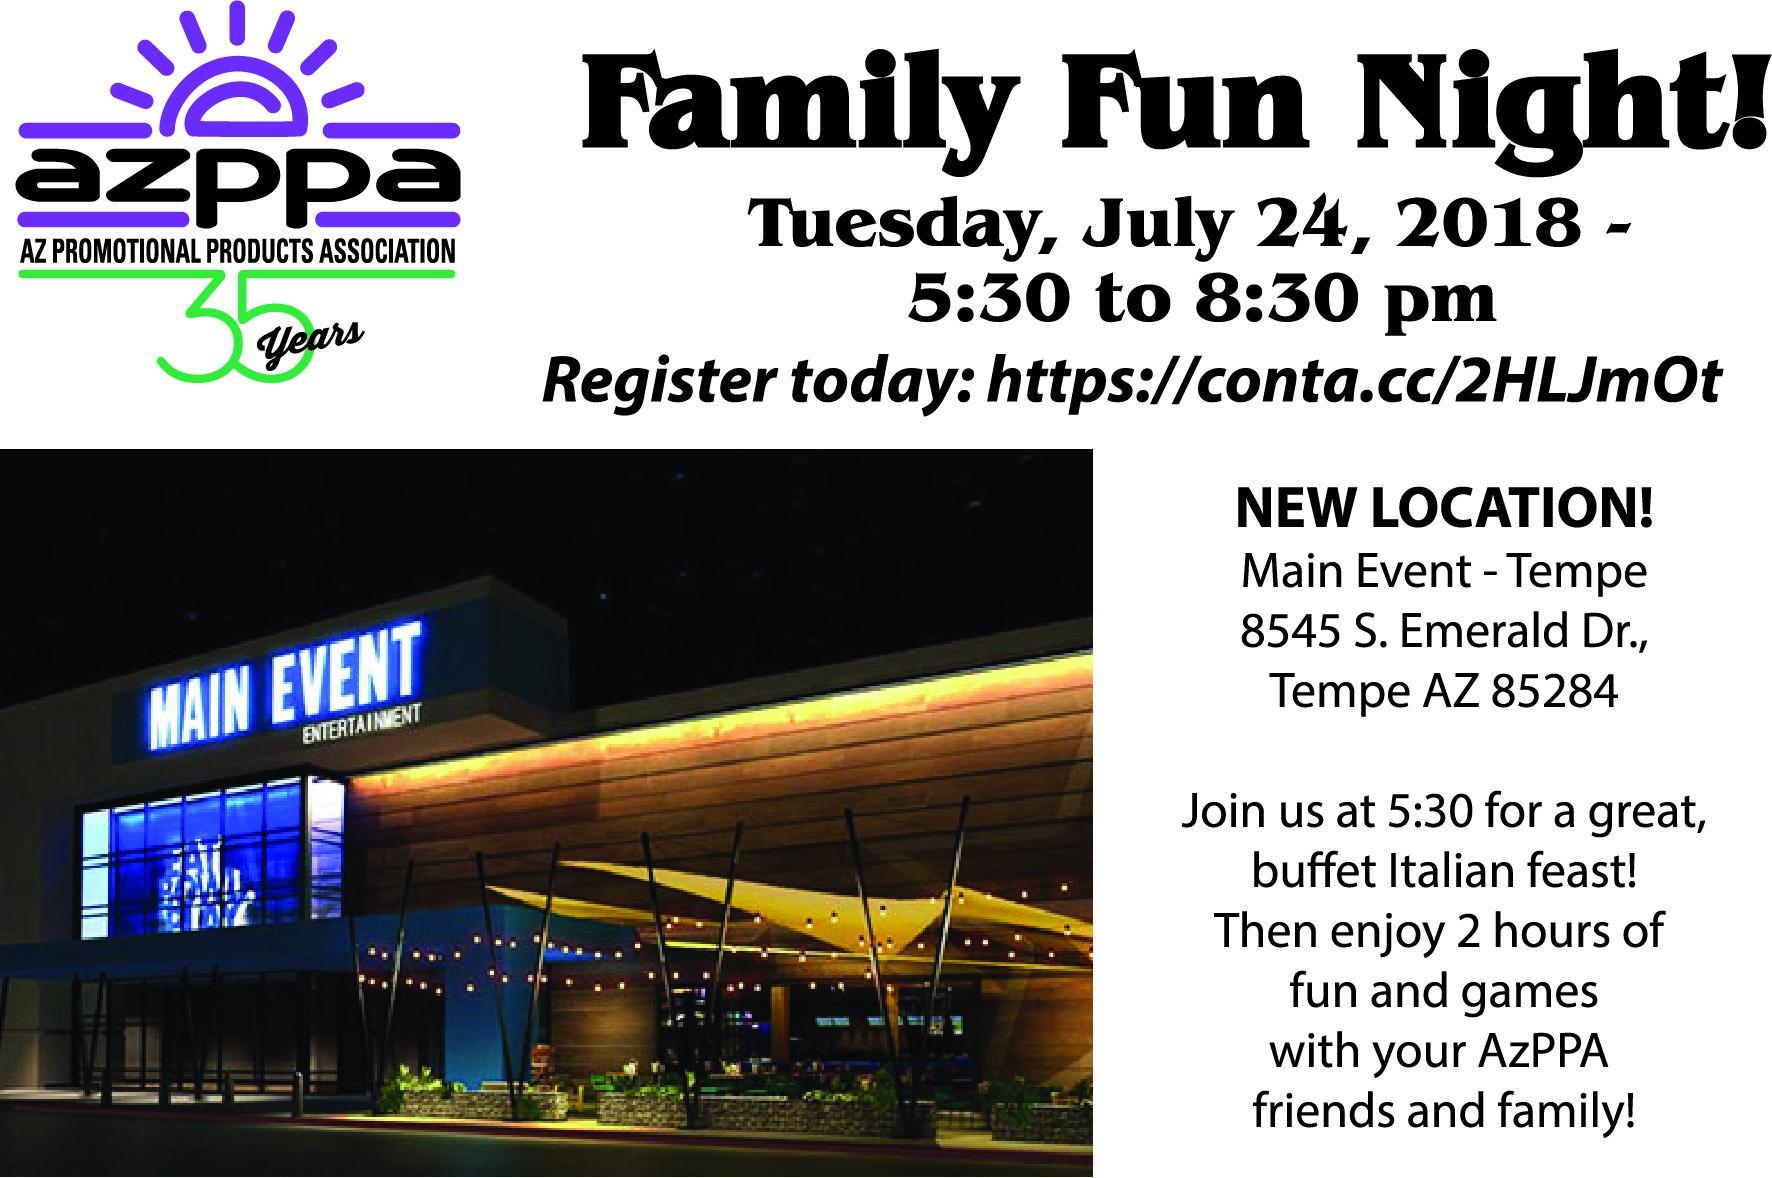 Arizona Promotional Products Association - Family Fun Night